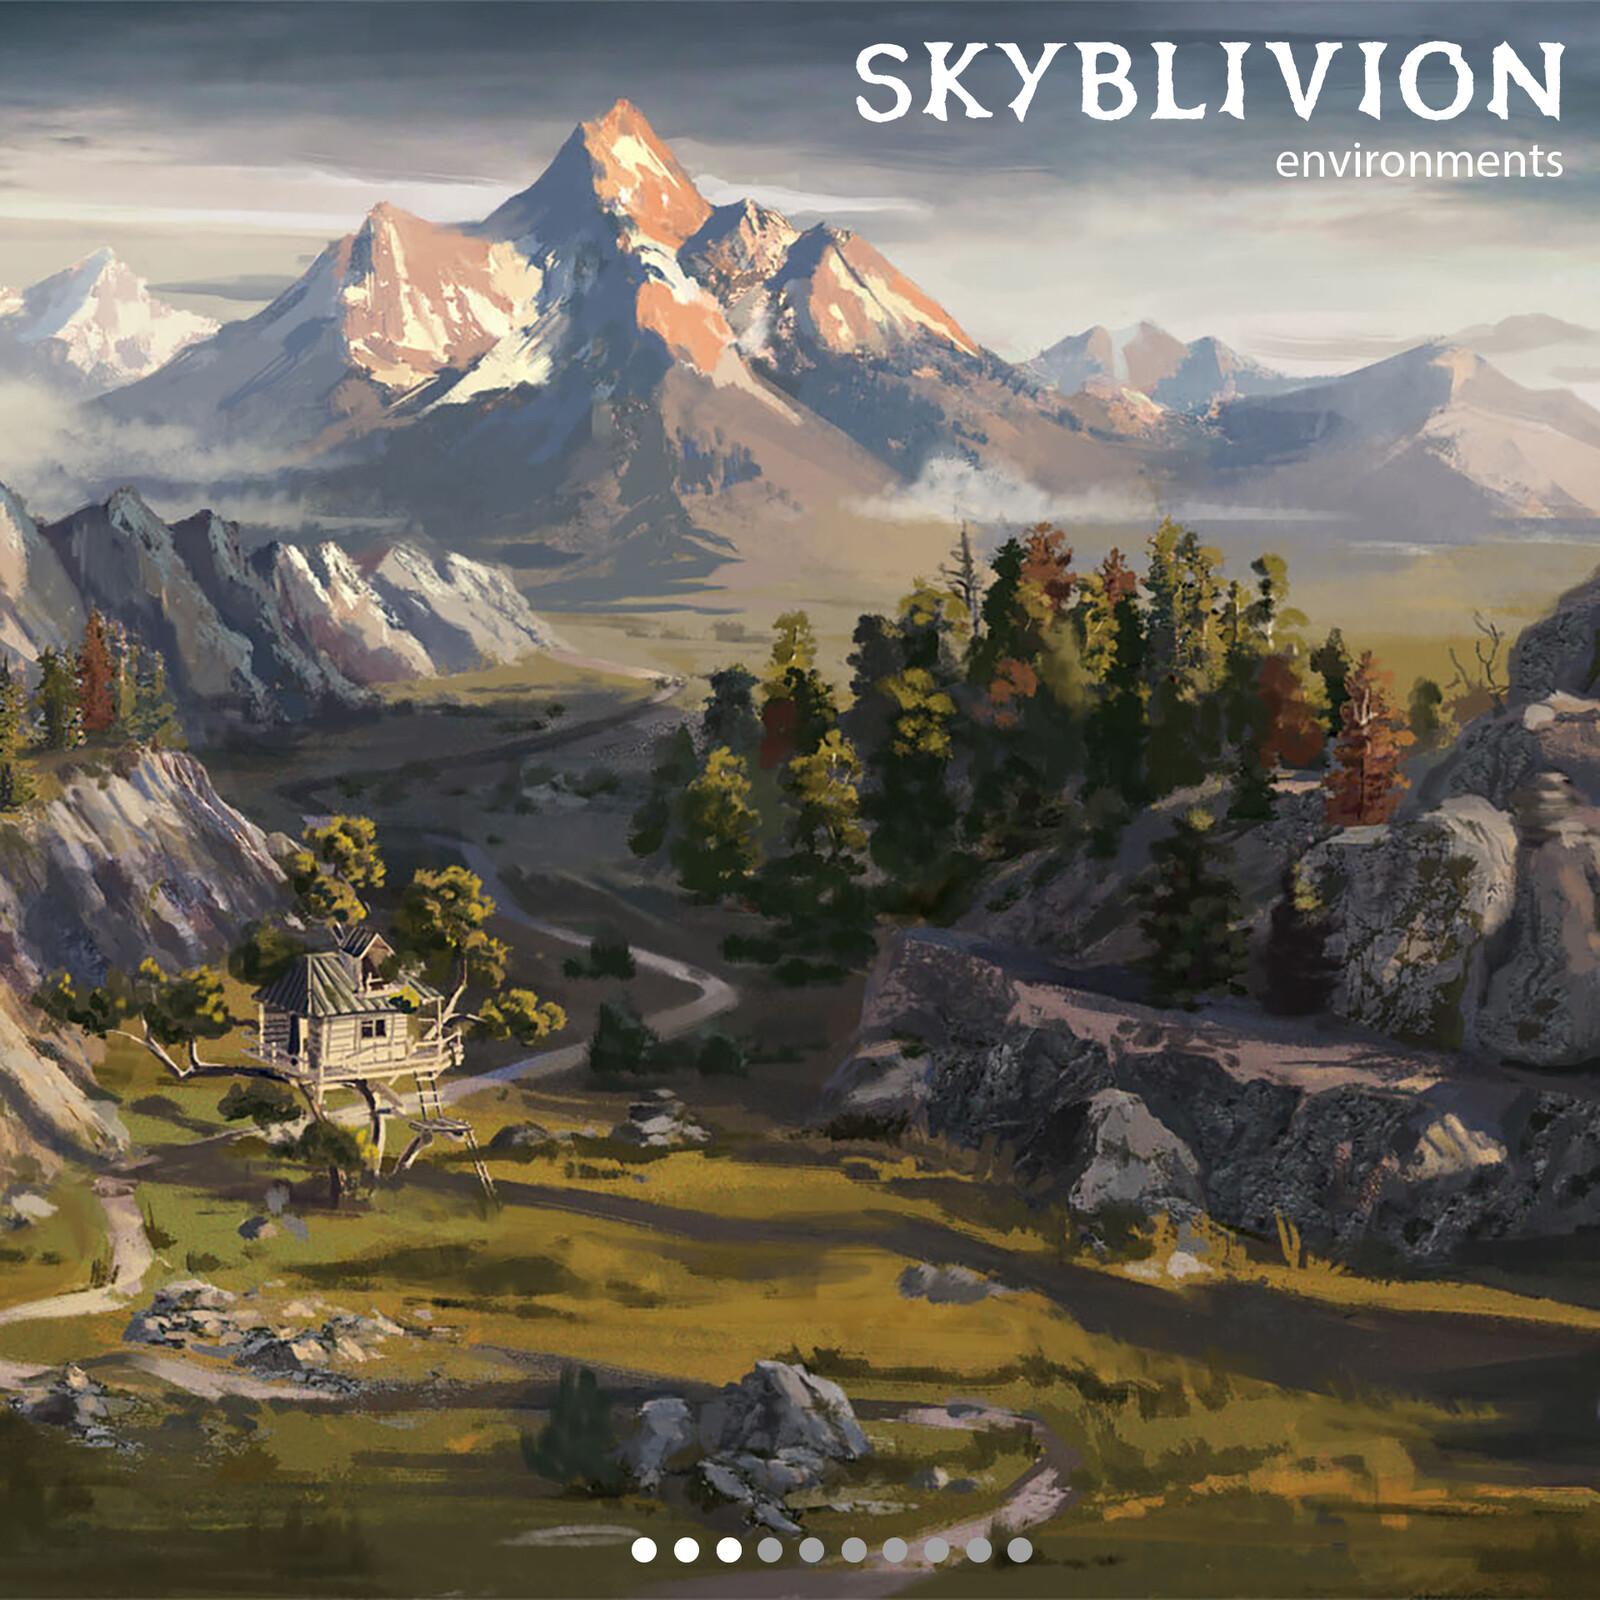 Skyblivion: Environments